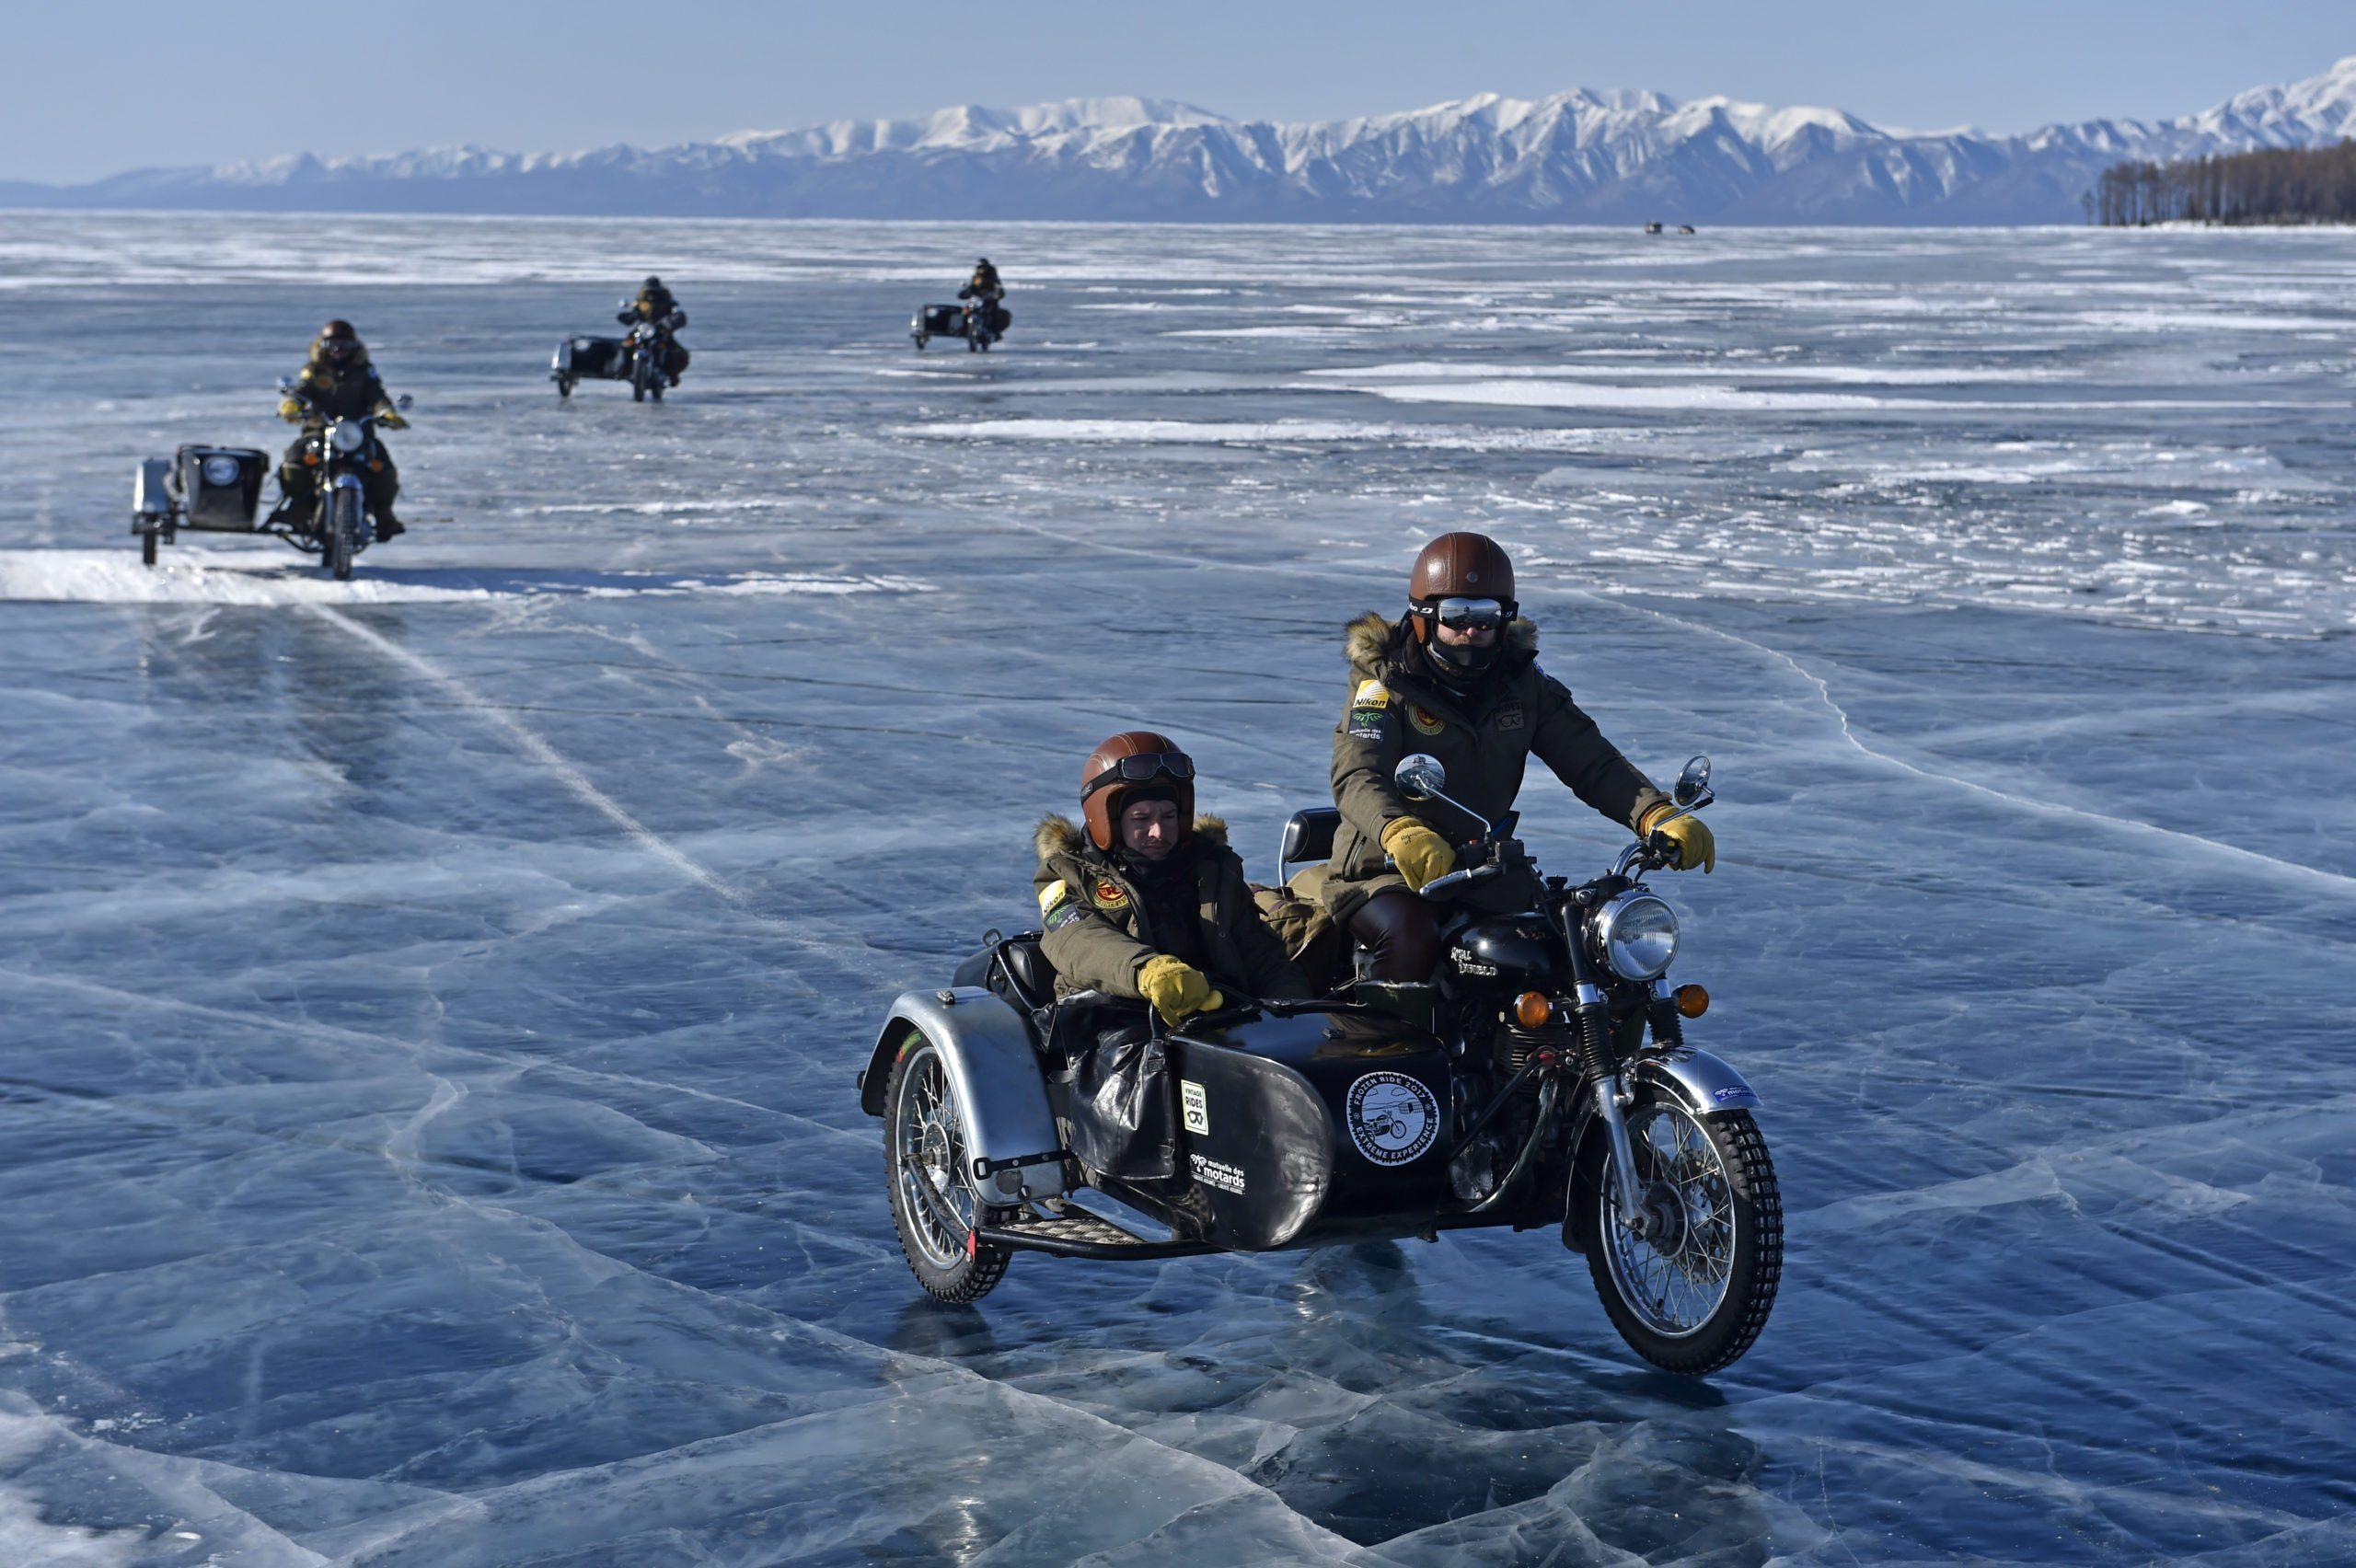 Motorcycle road trip Mongolia - Frozen Ride